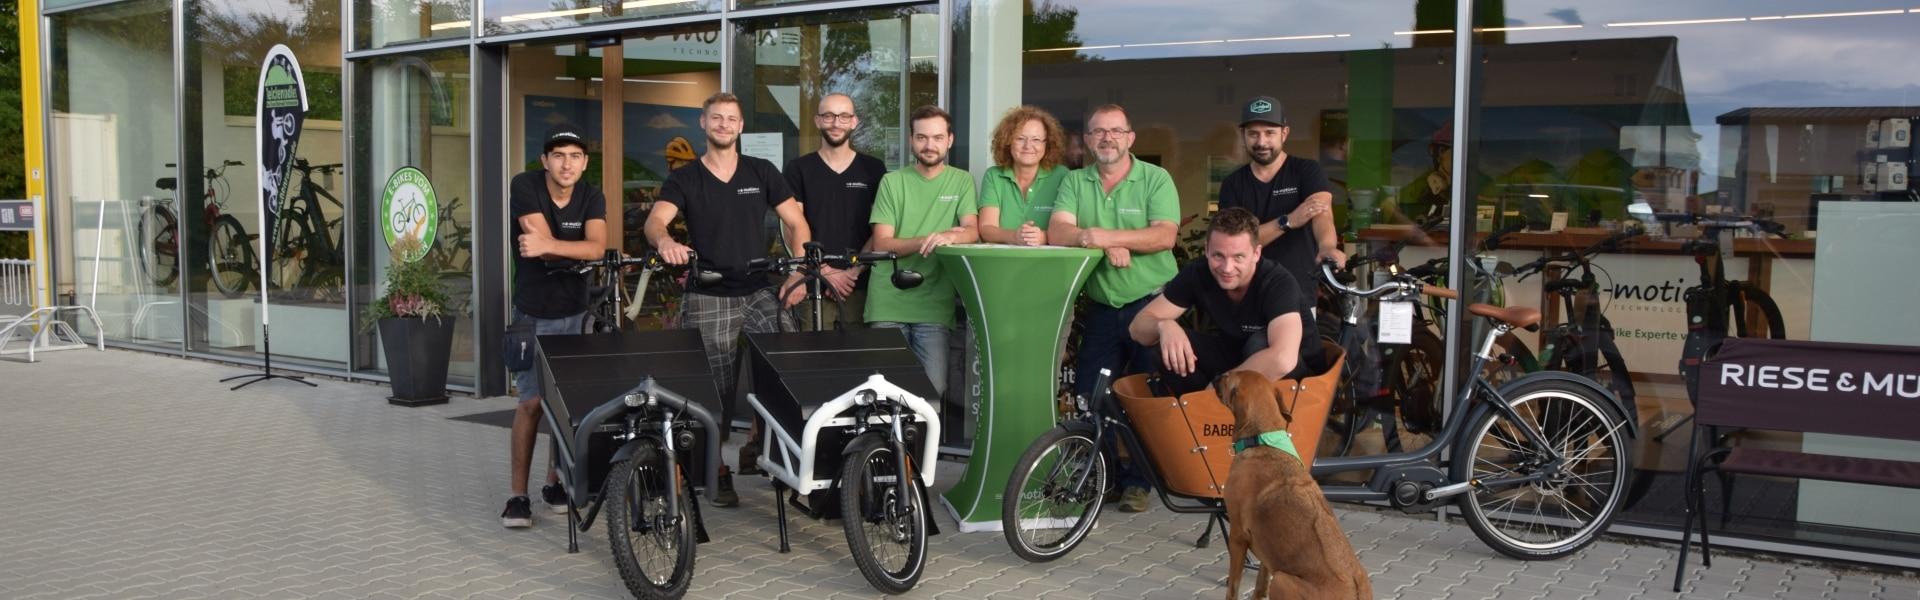 Das Team der e-motion e-Bike Welt Freiburg Süd